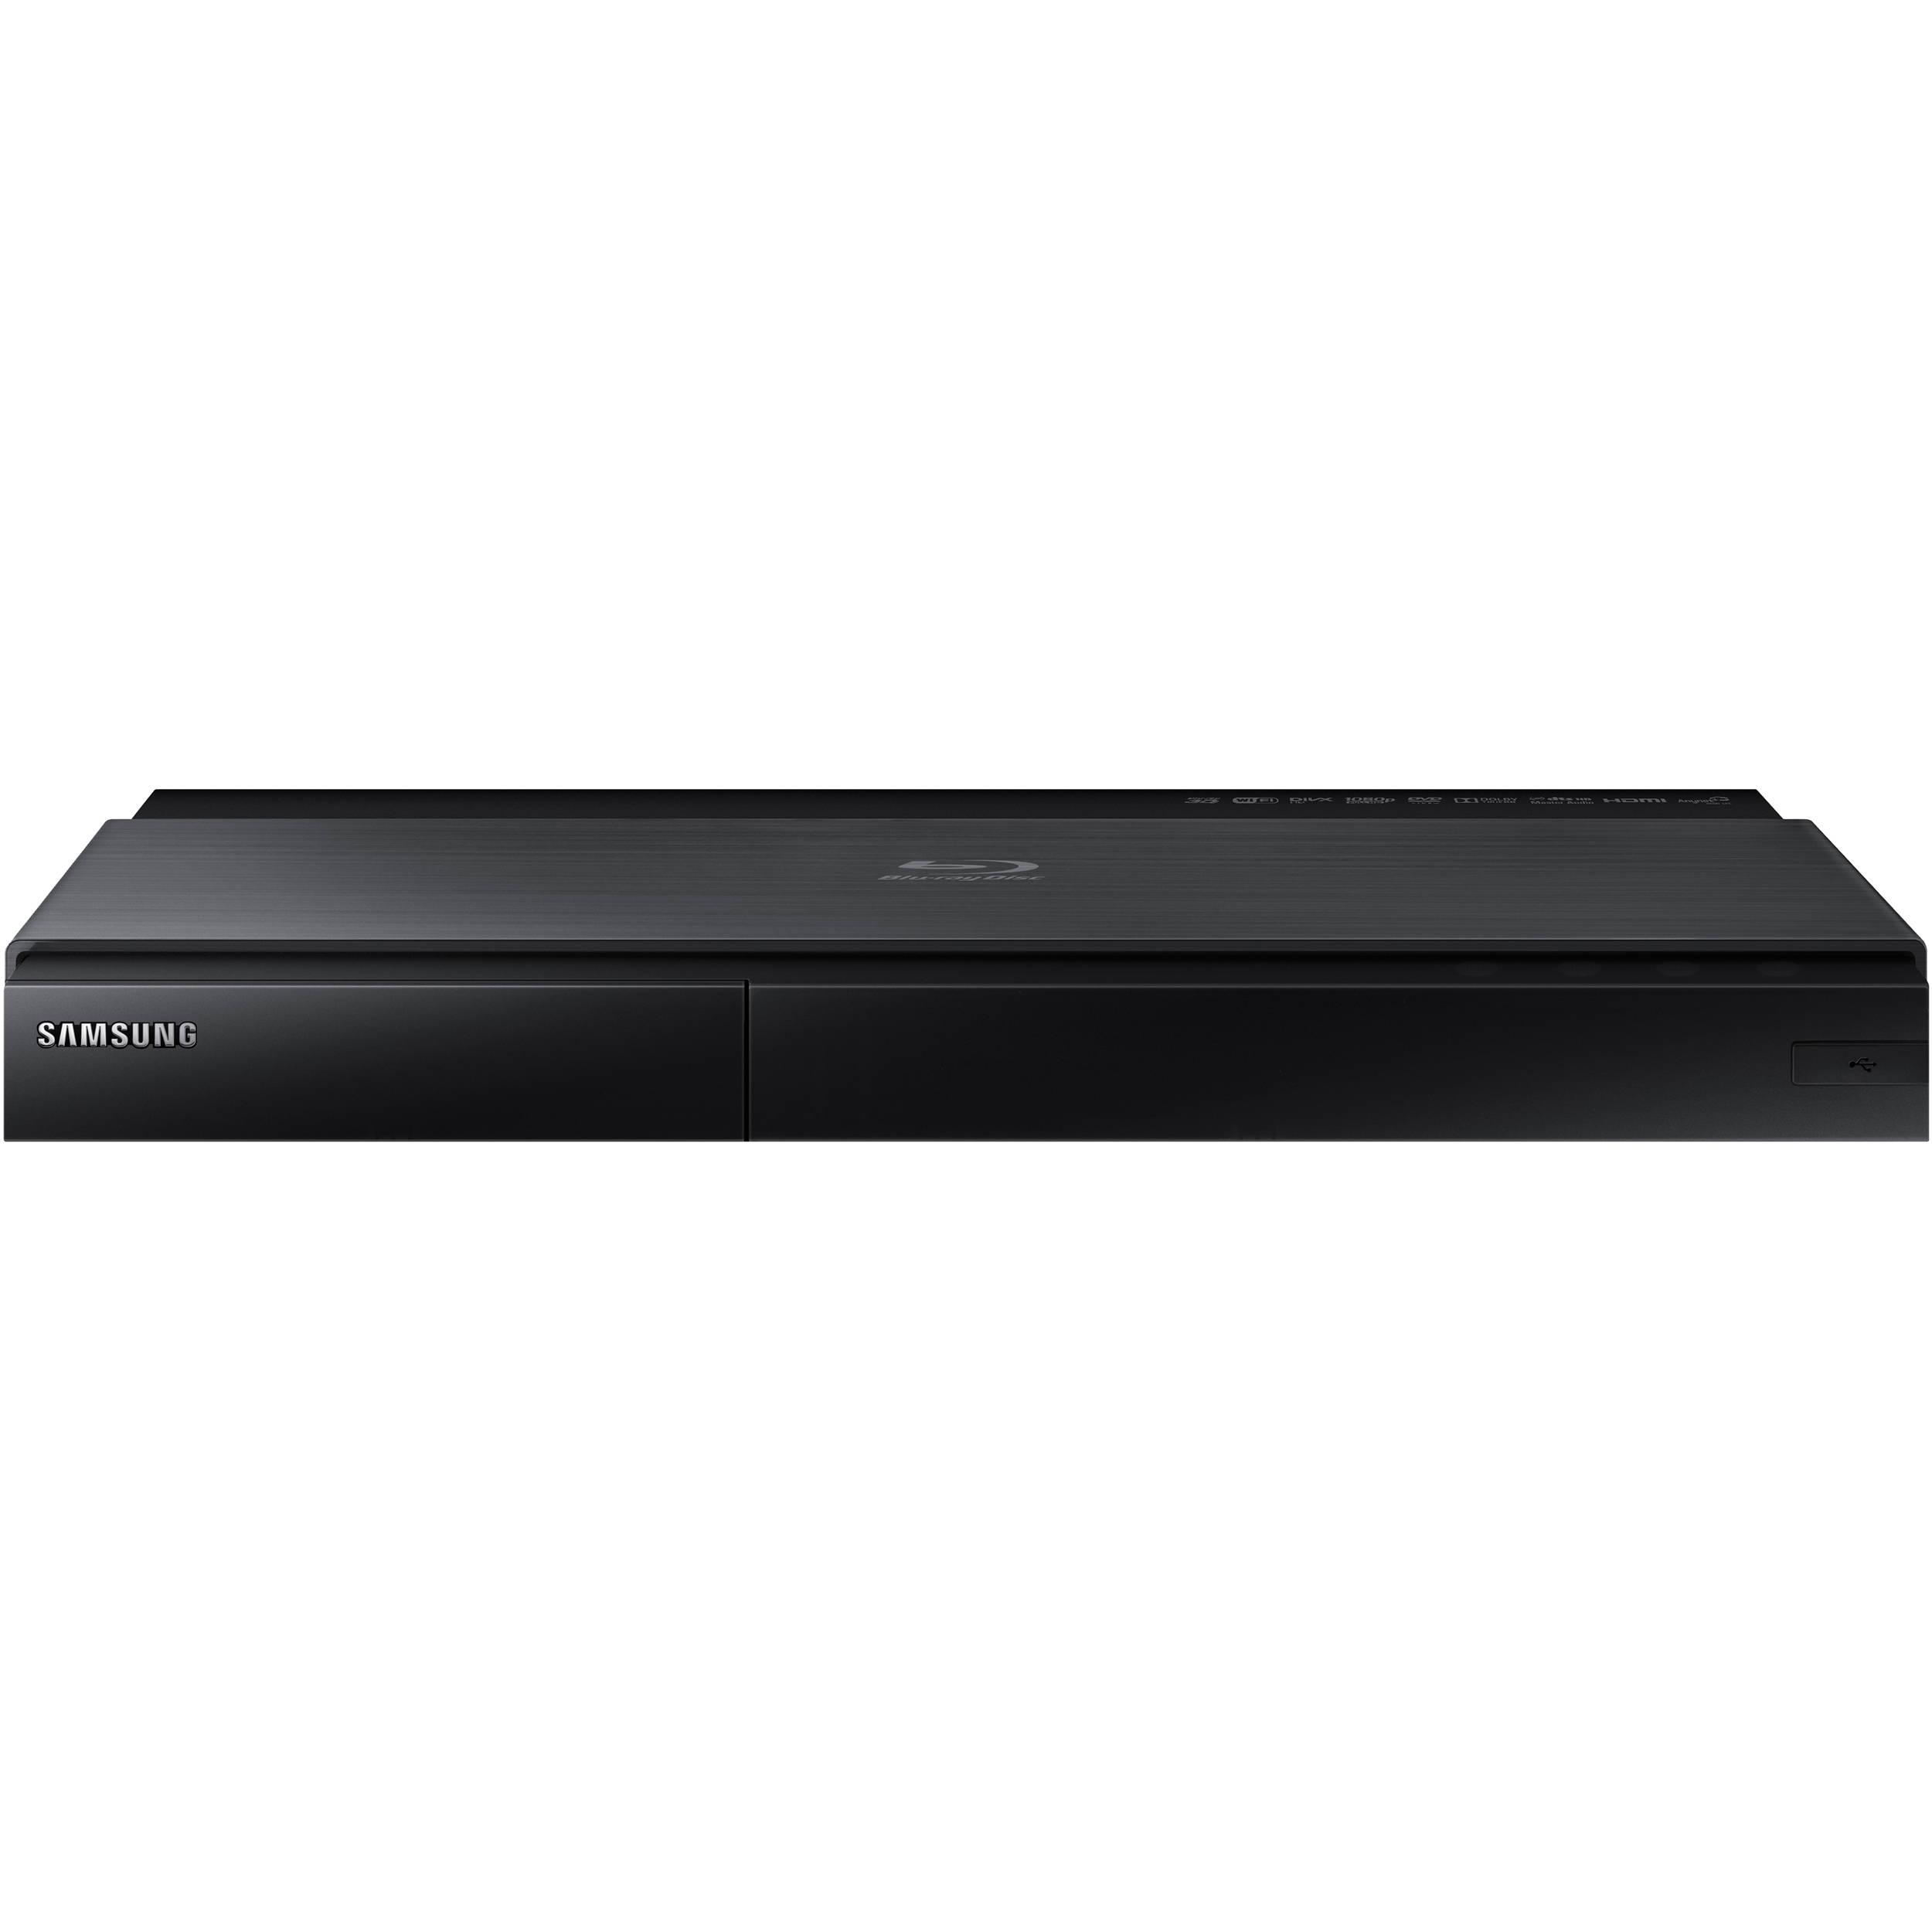 Samsung BD-J7500 Smart 3D Blu-ray Player